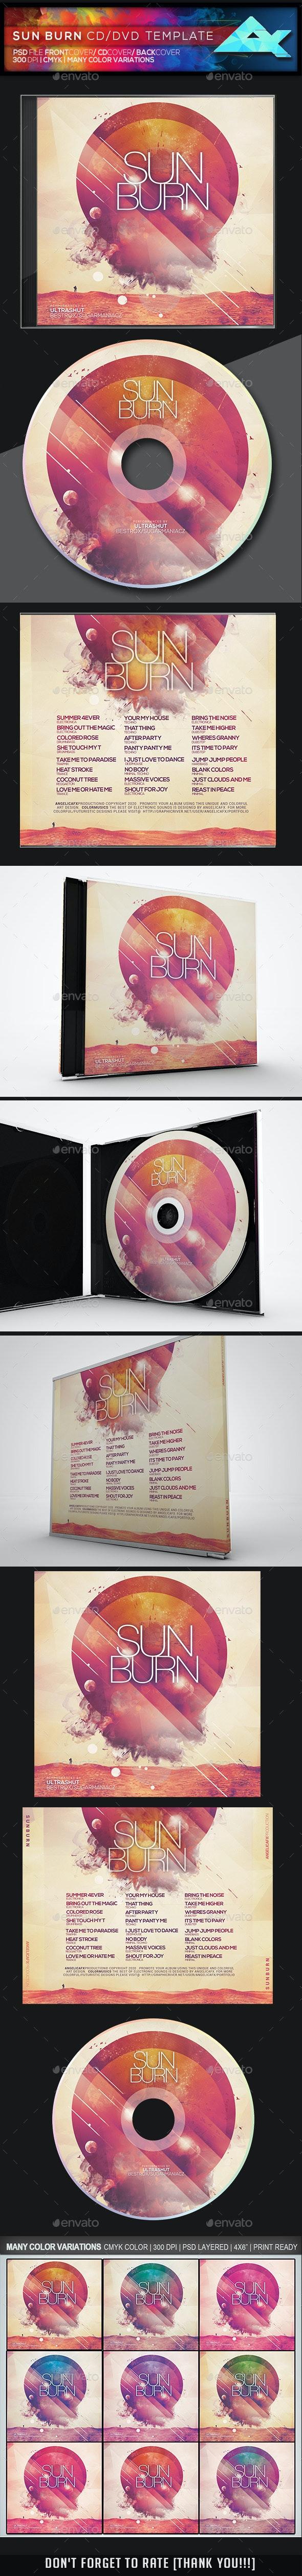 Sun Burn CD/DVD Template - CD & DVD Artwork Print Templates